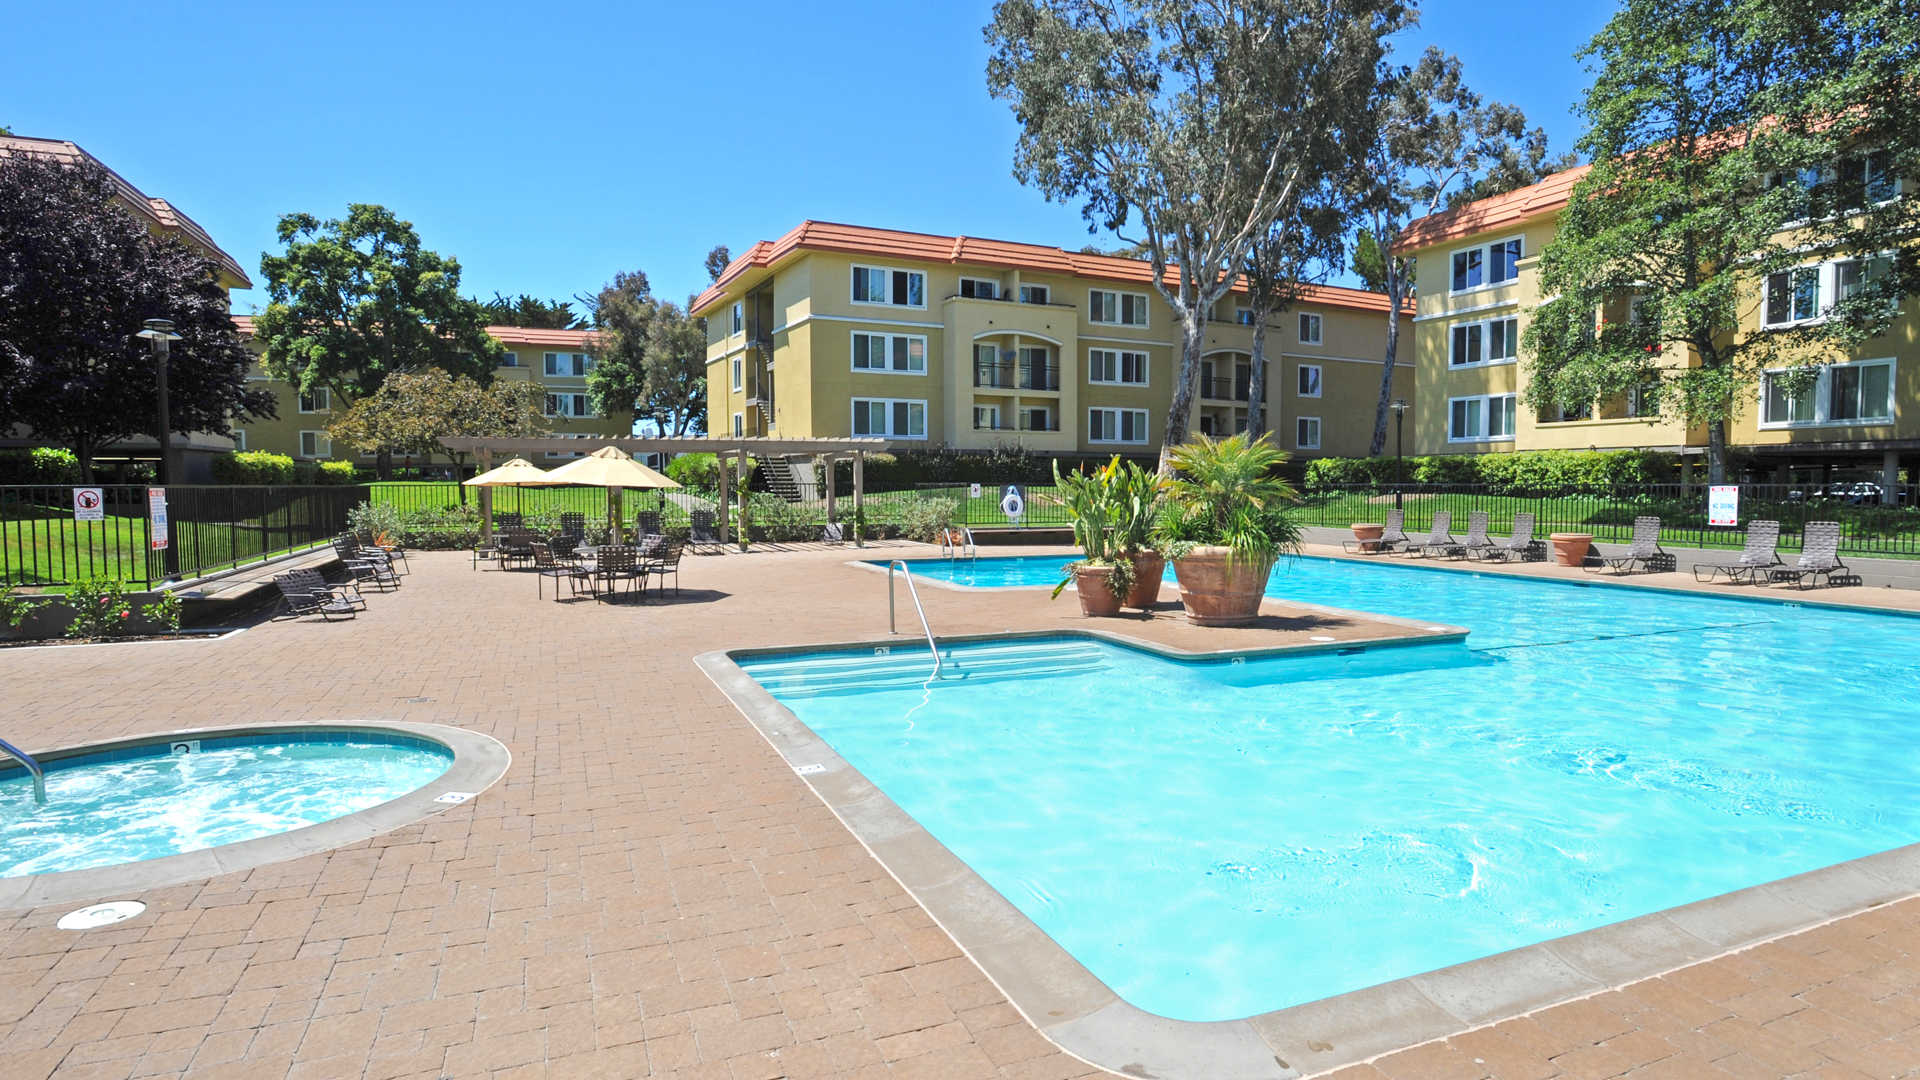 Pictures Of Apartments northpark apartments - burlingame - 1080 carolan avenue